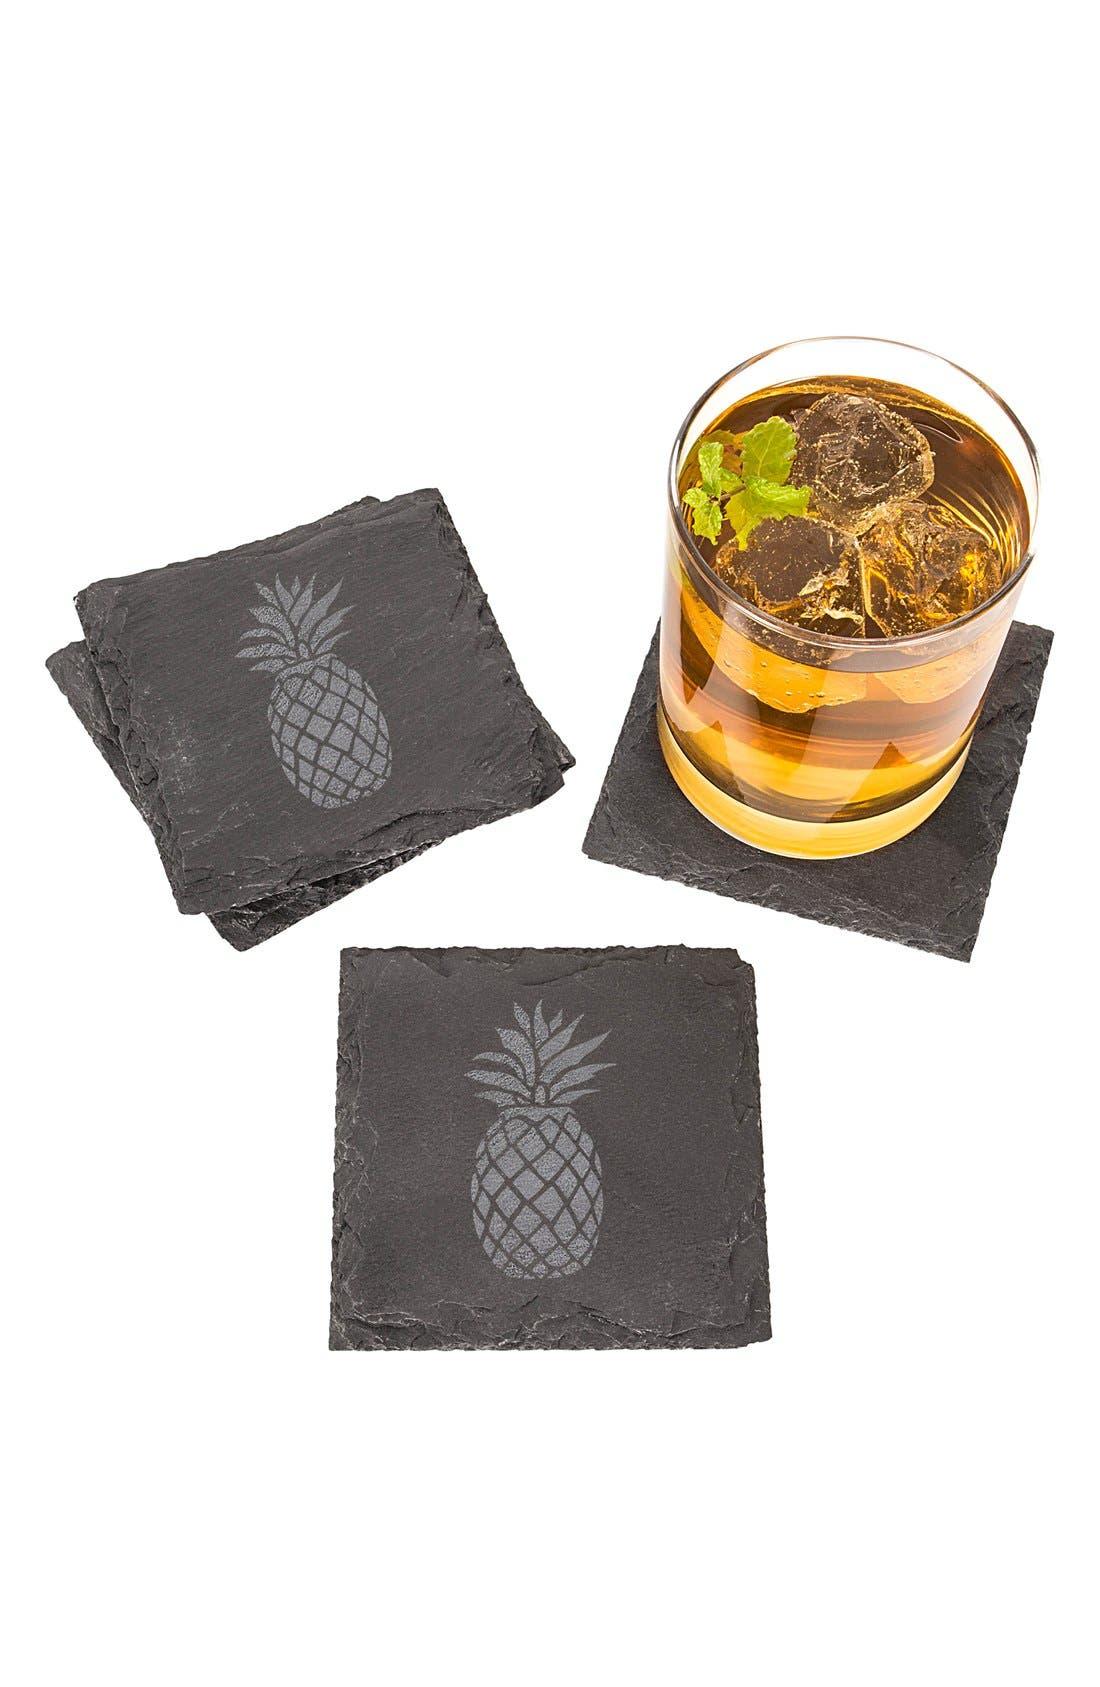 Set of 4 Pineapple Coasters,                             Main thumbnail 1, color,                             Grey